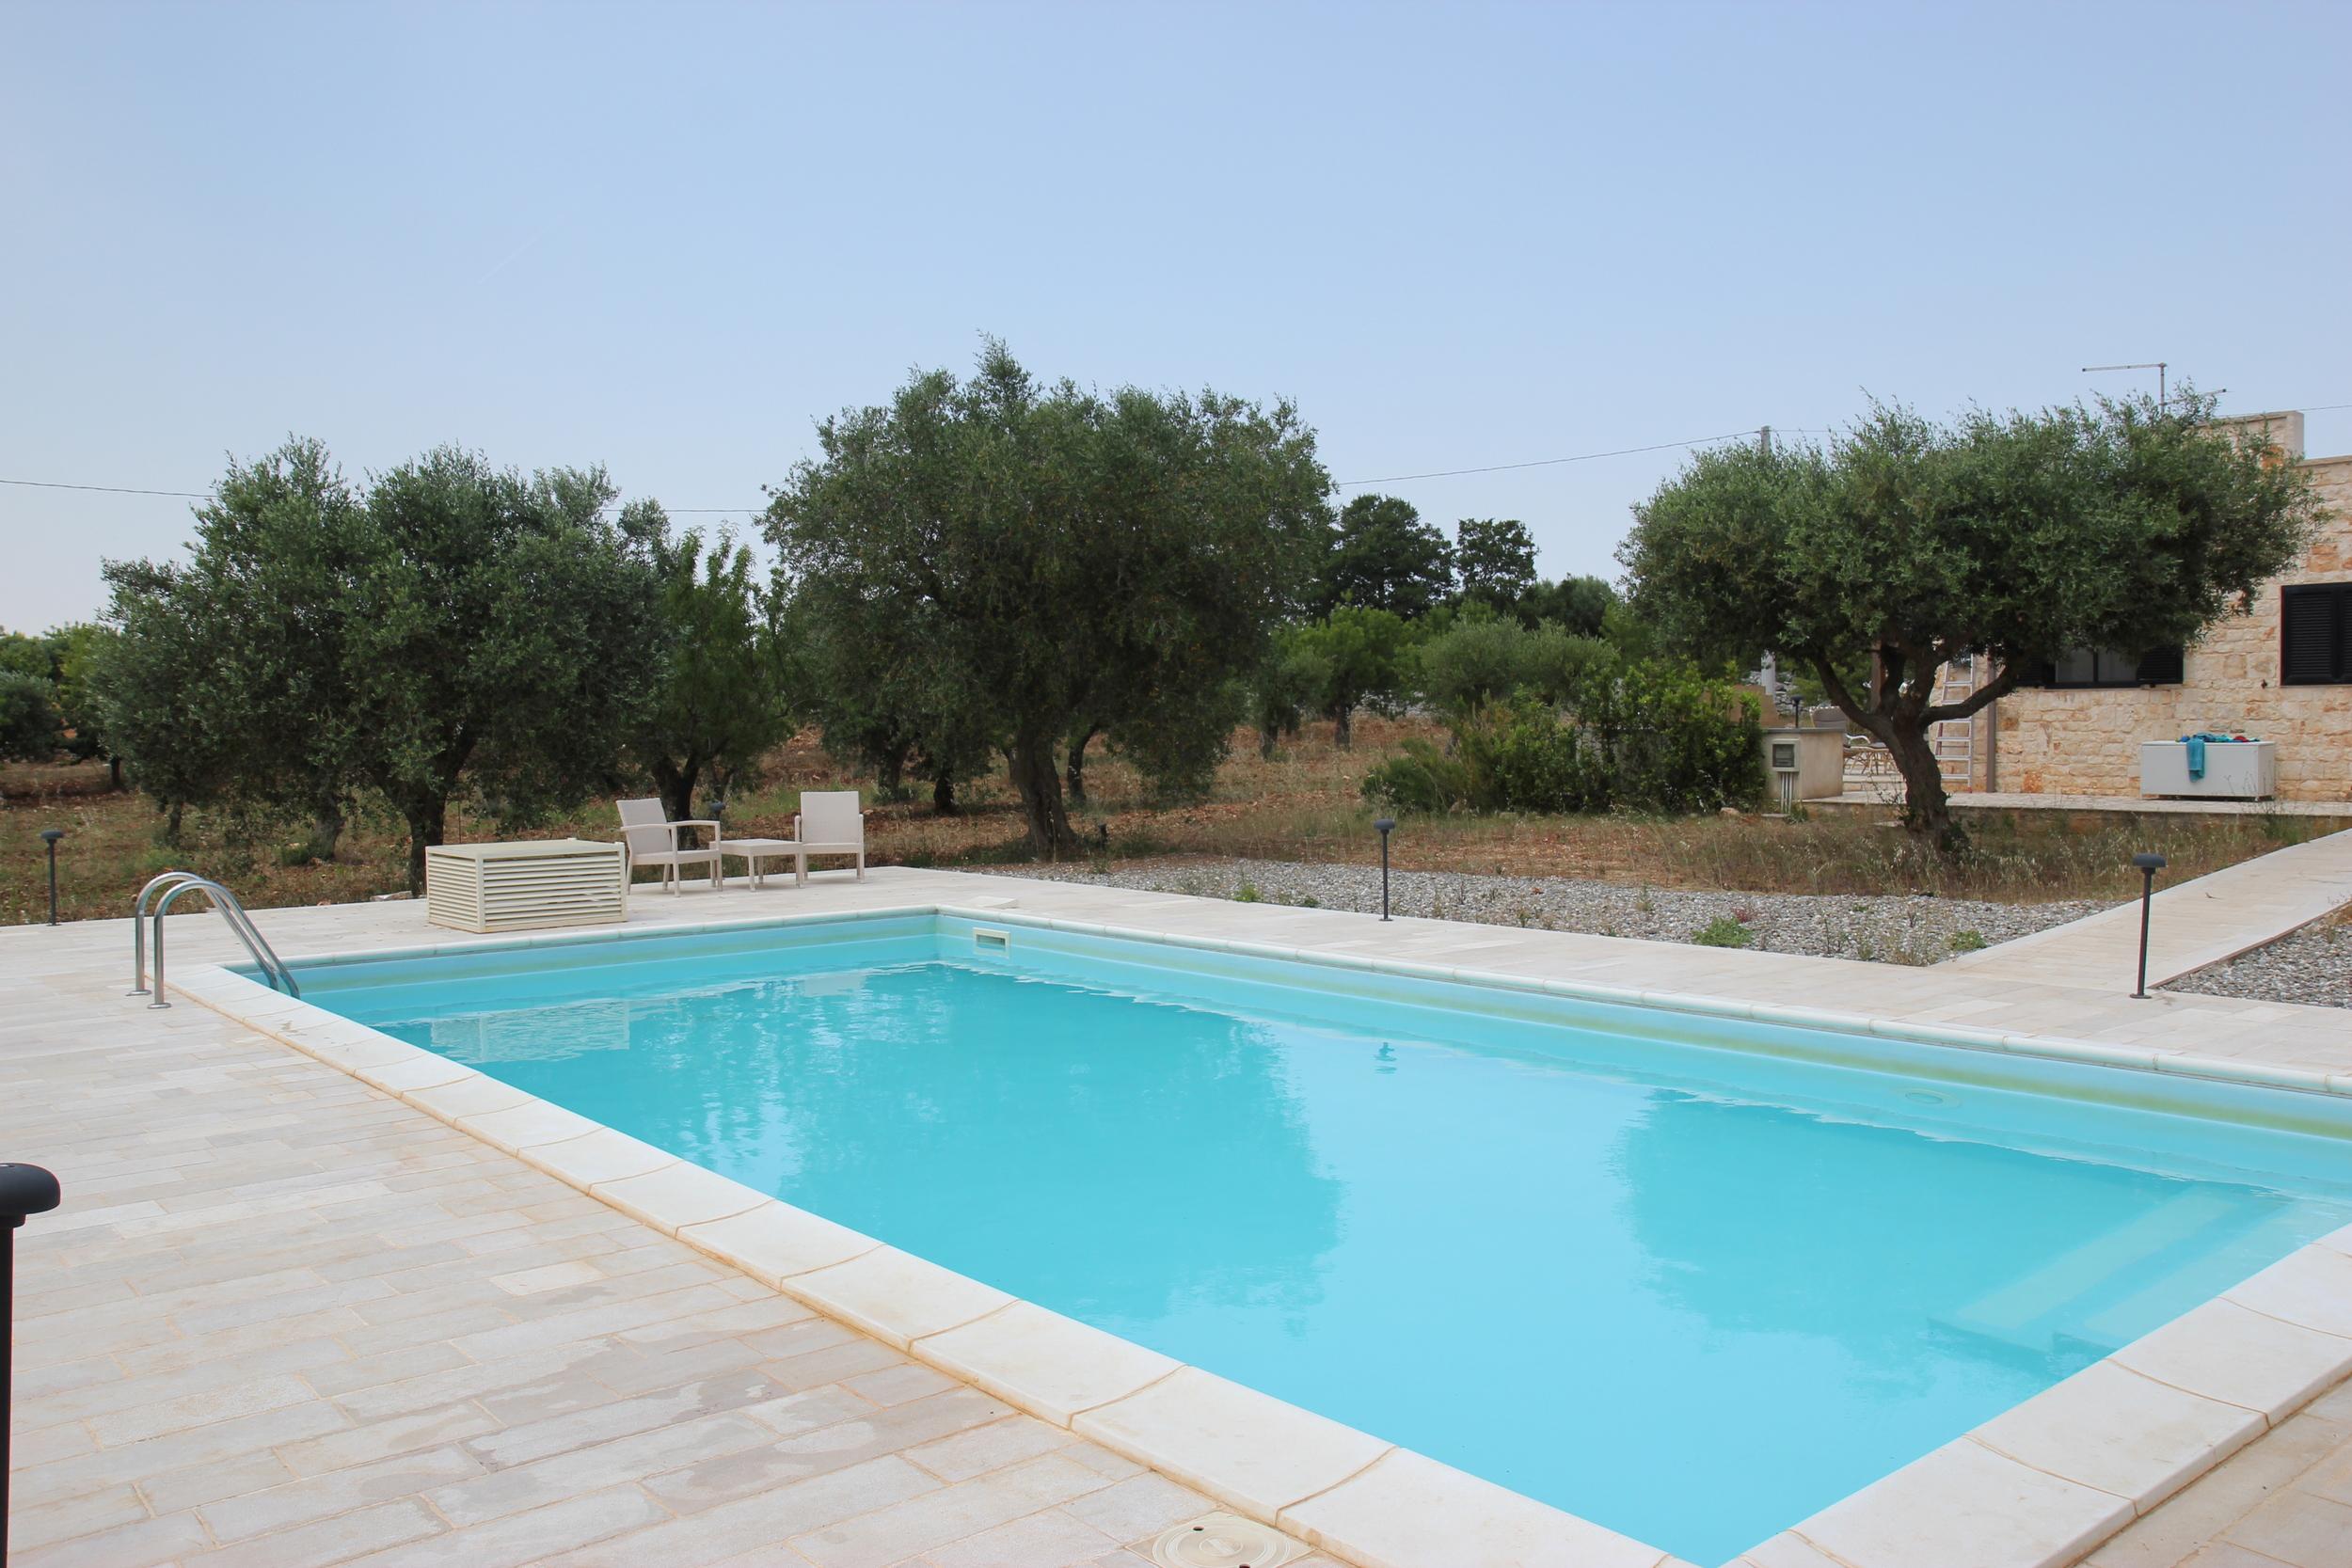 Puglia 2015-06 262.JPG